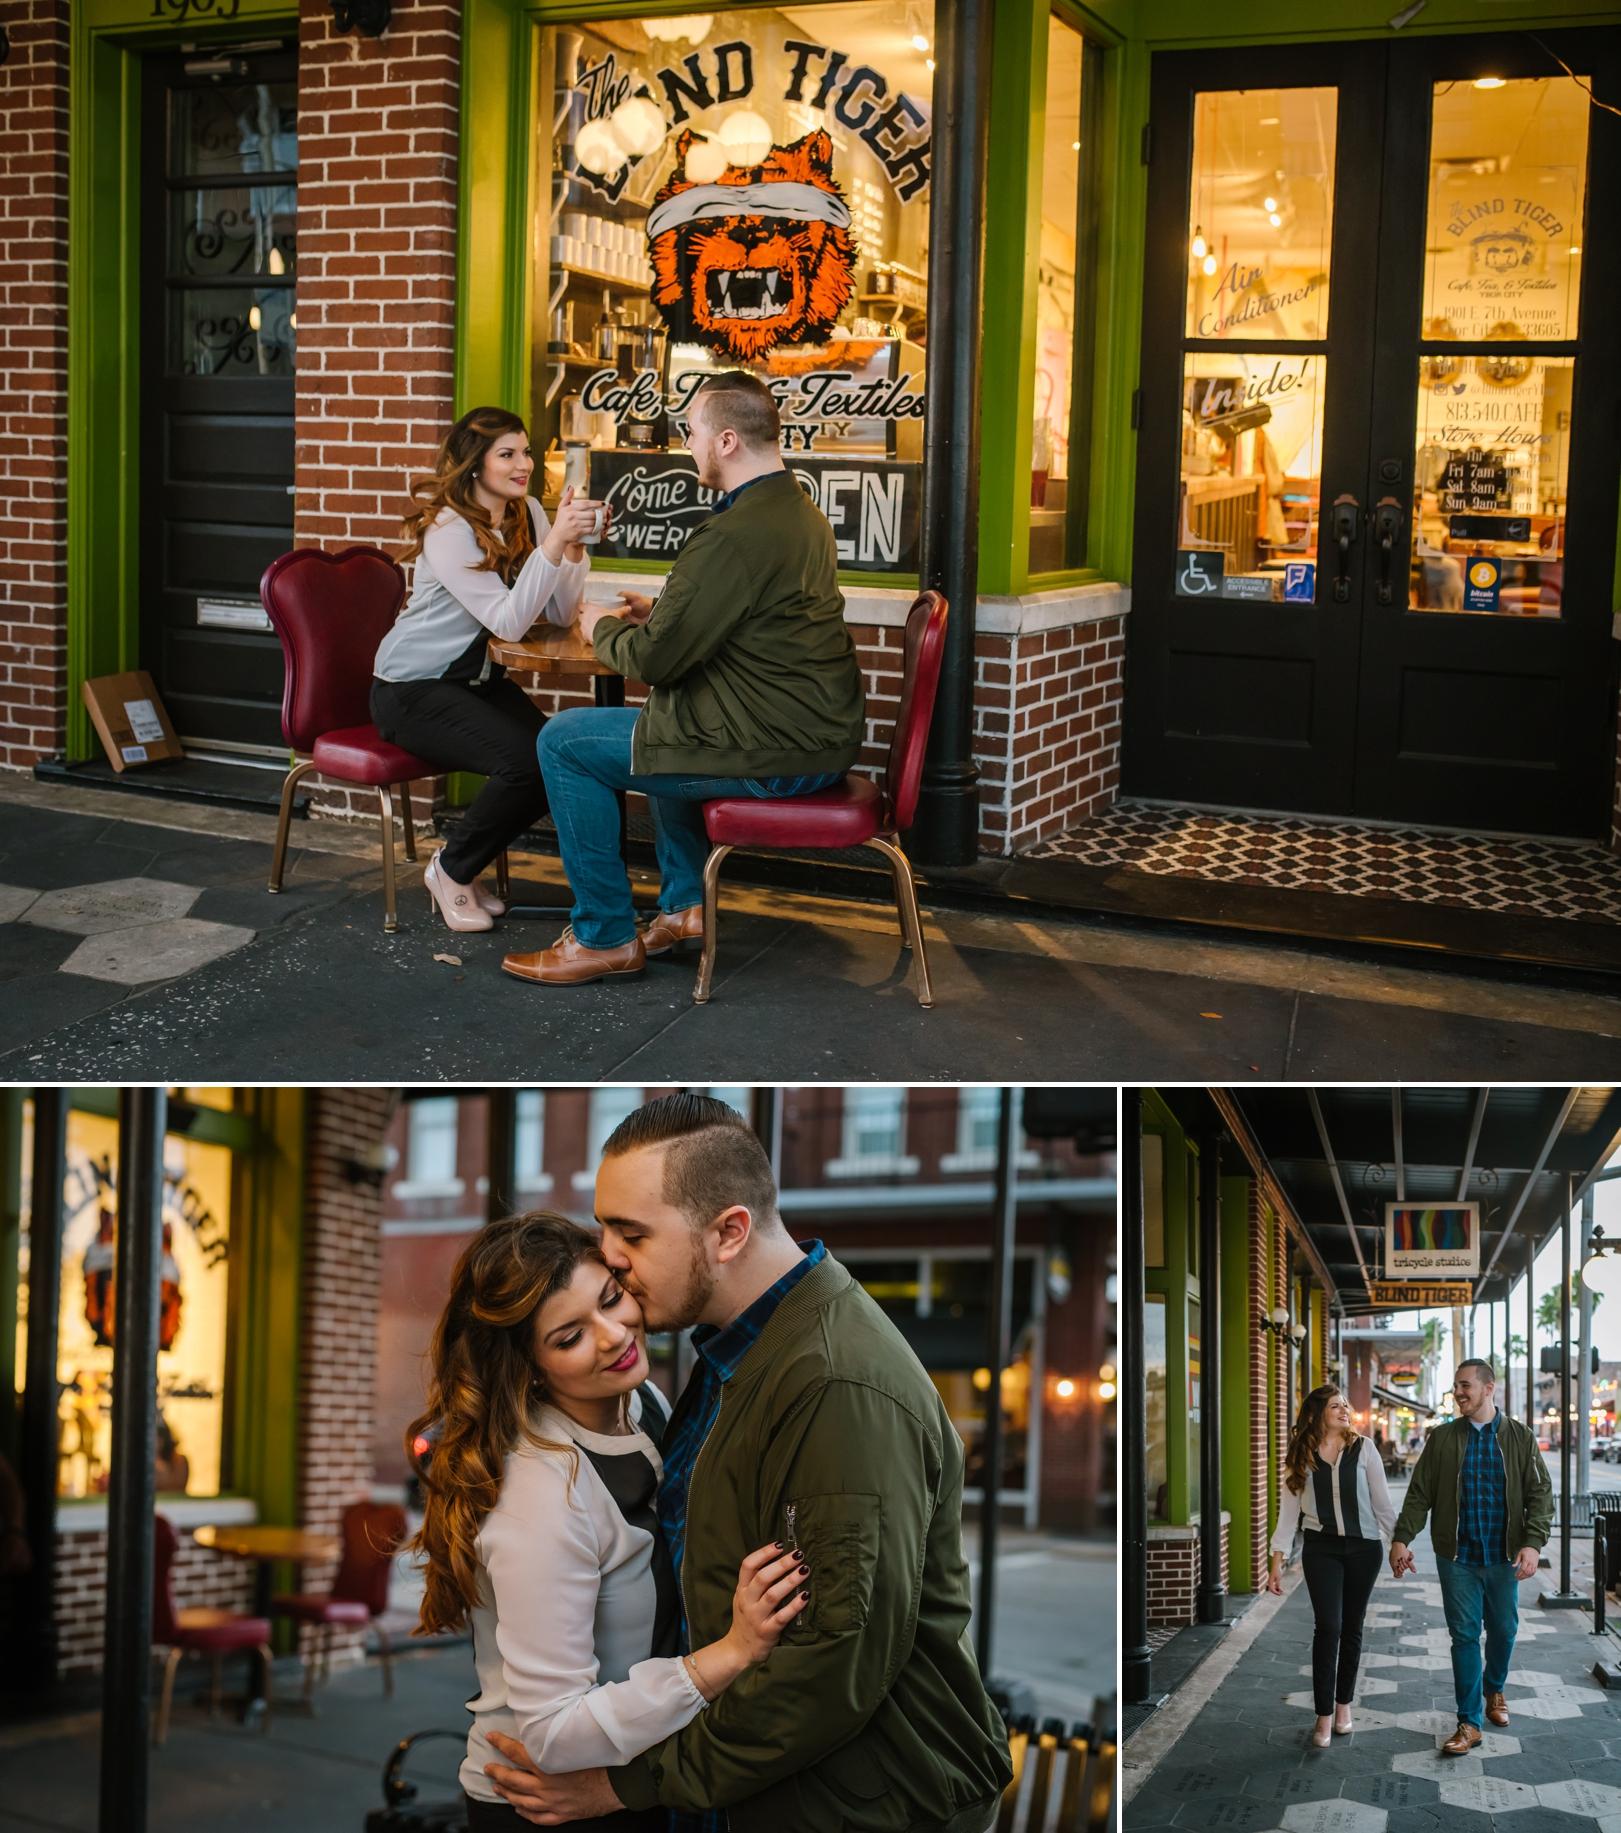 ashlee-hamon-wedding-photography-tampa-urban-cafe-engagement_0003.jpg